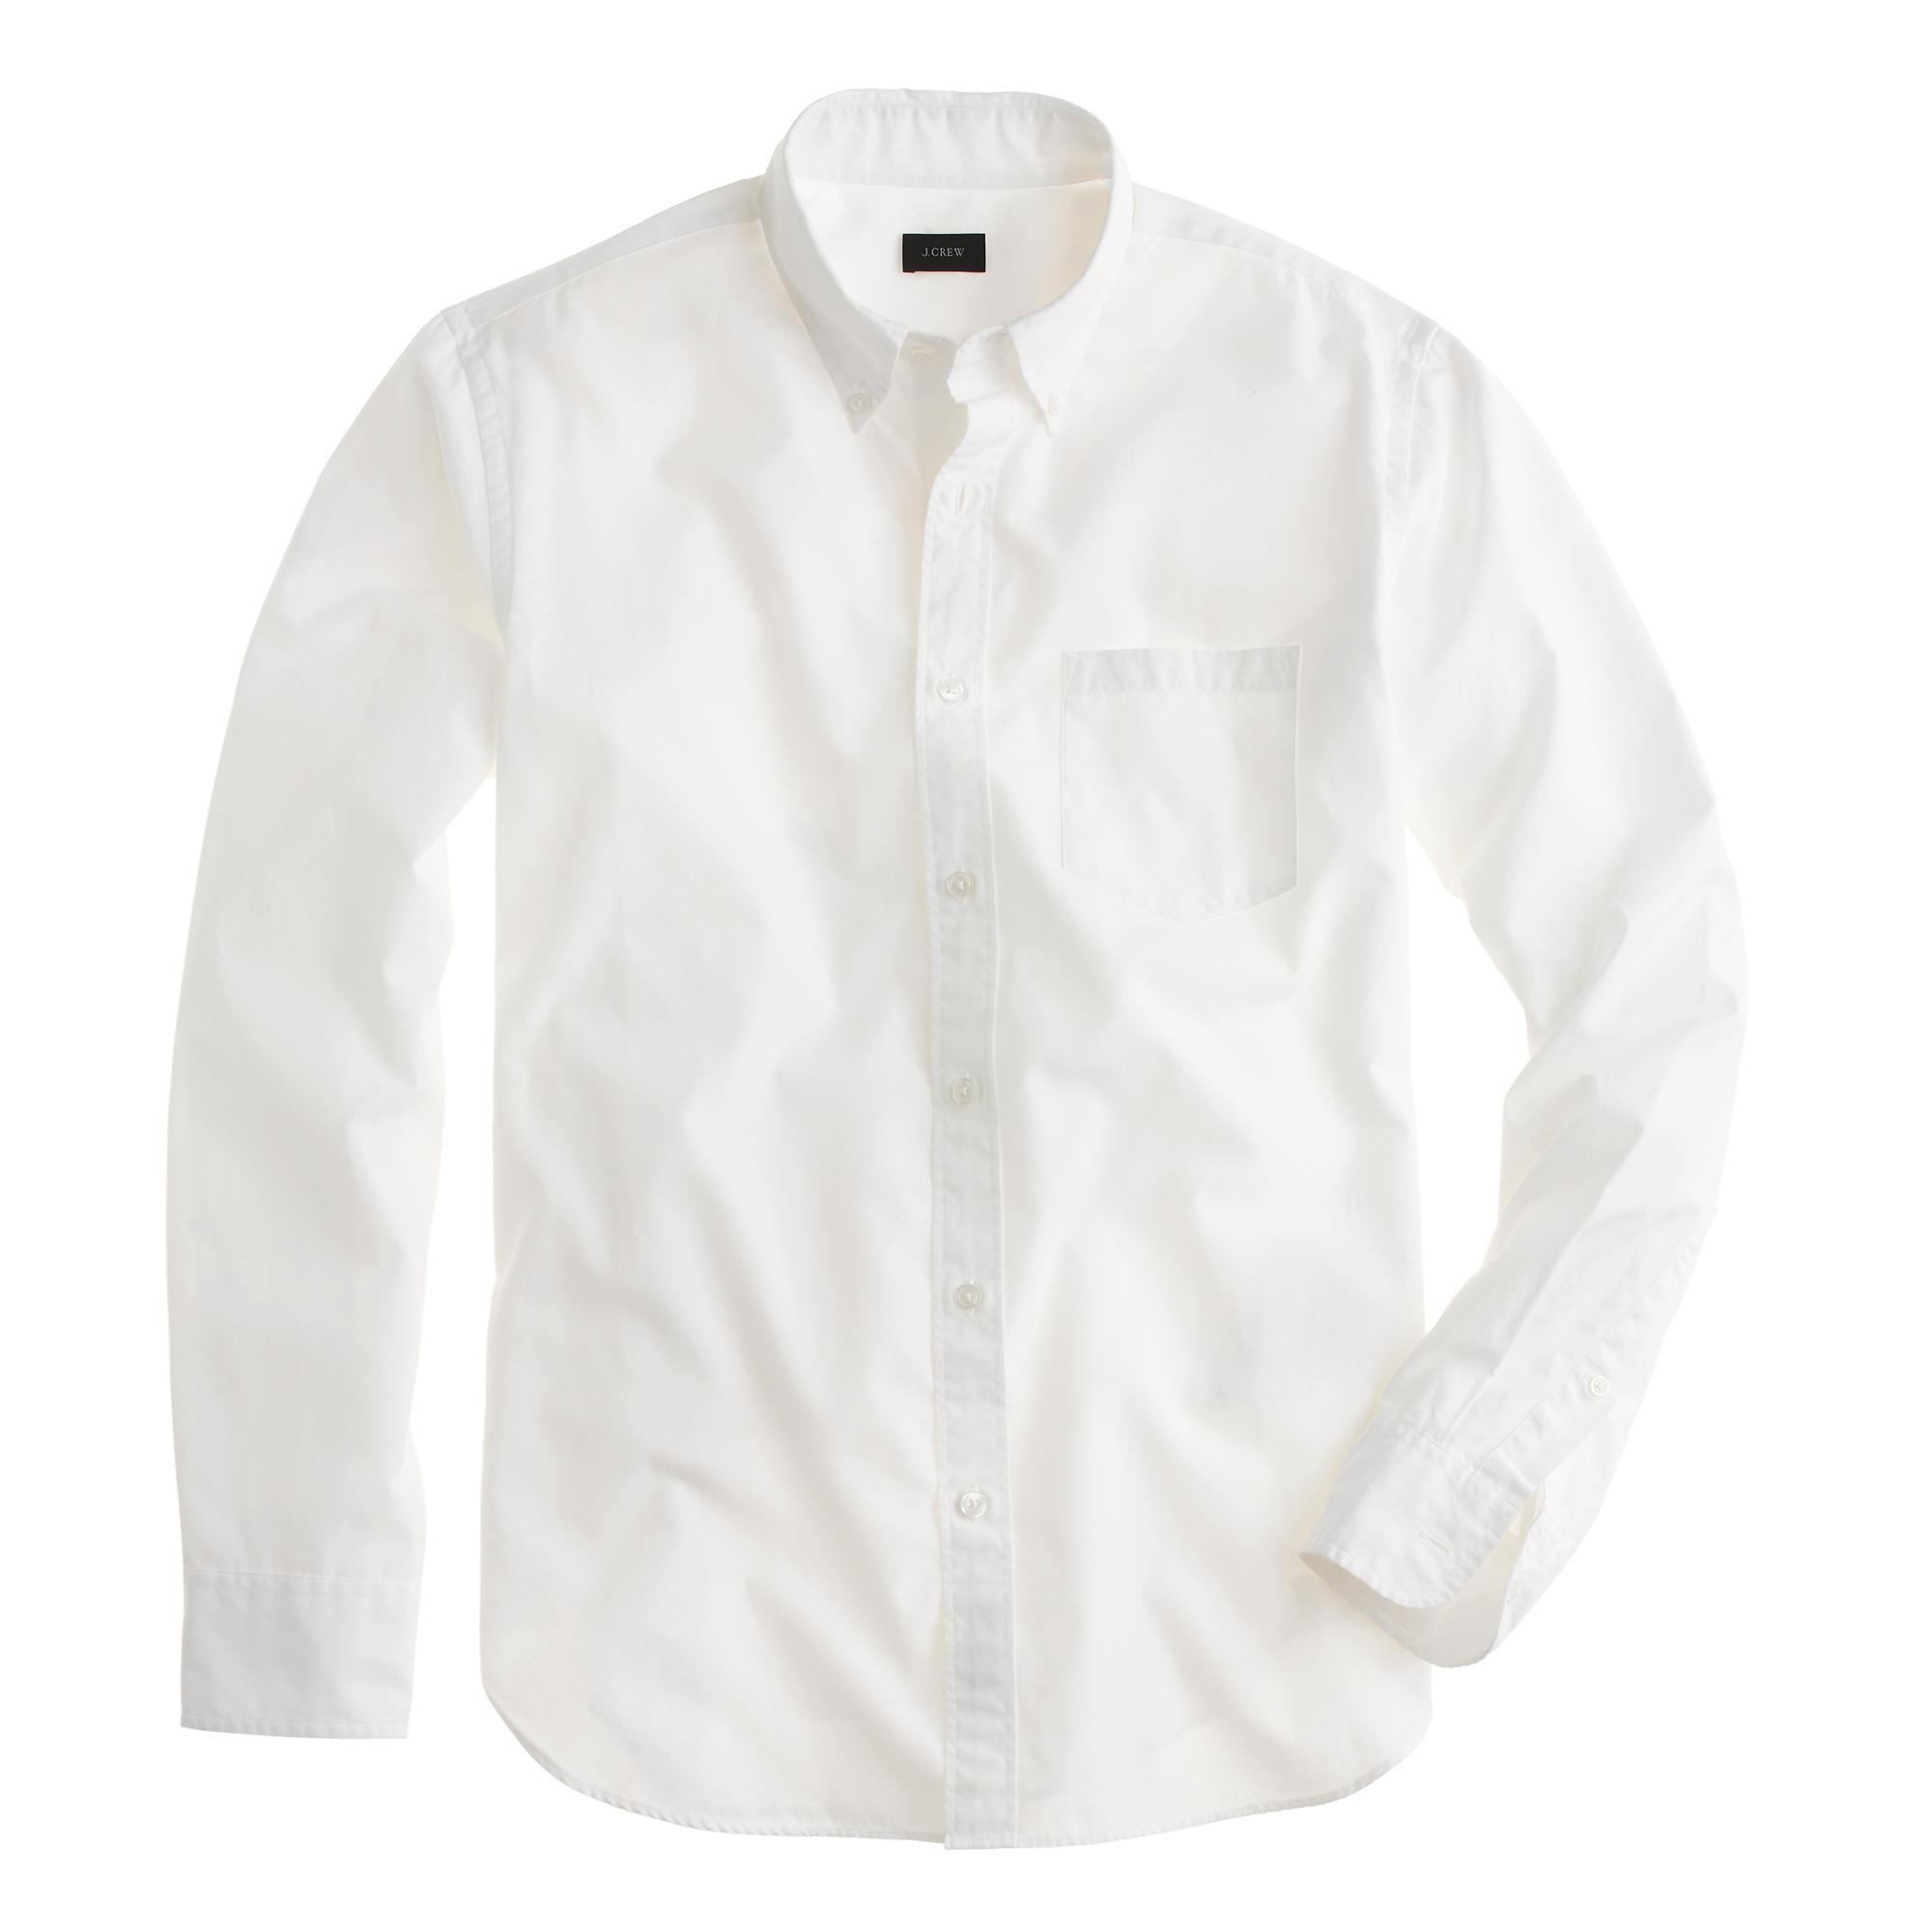 Men's Secret Wash Shirt In White - Men's Woven Shirts